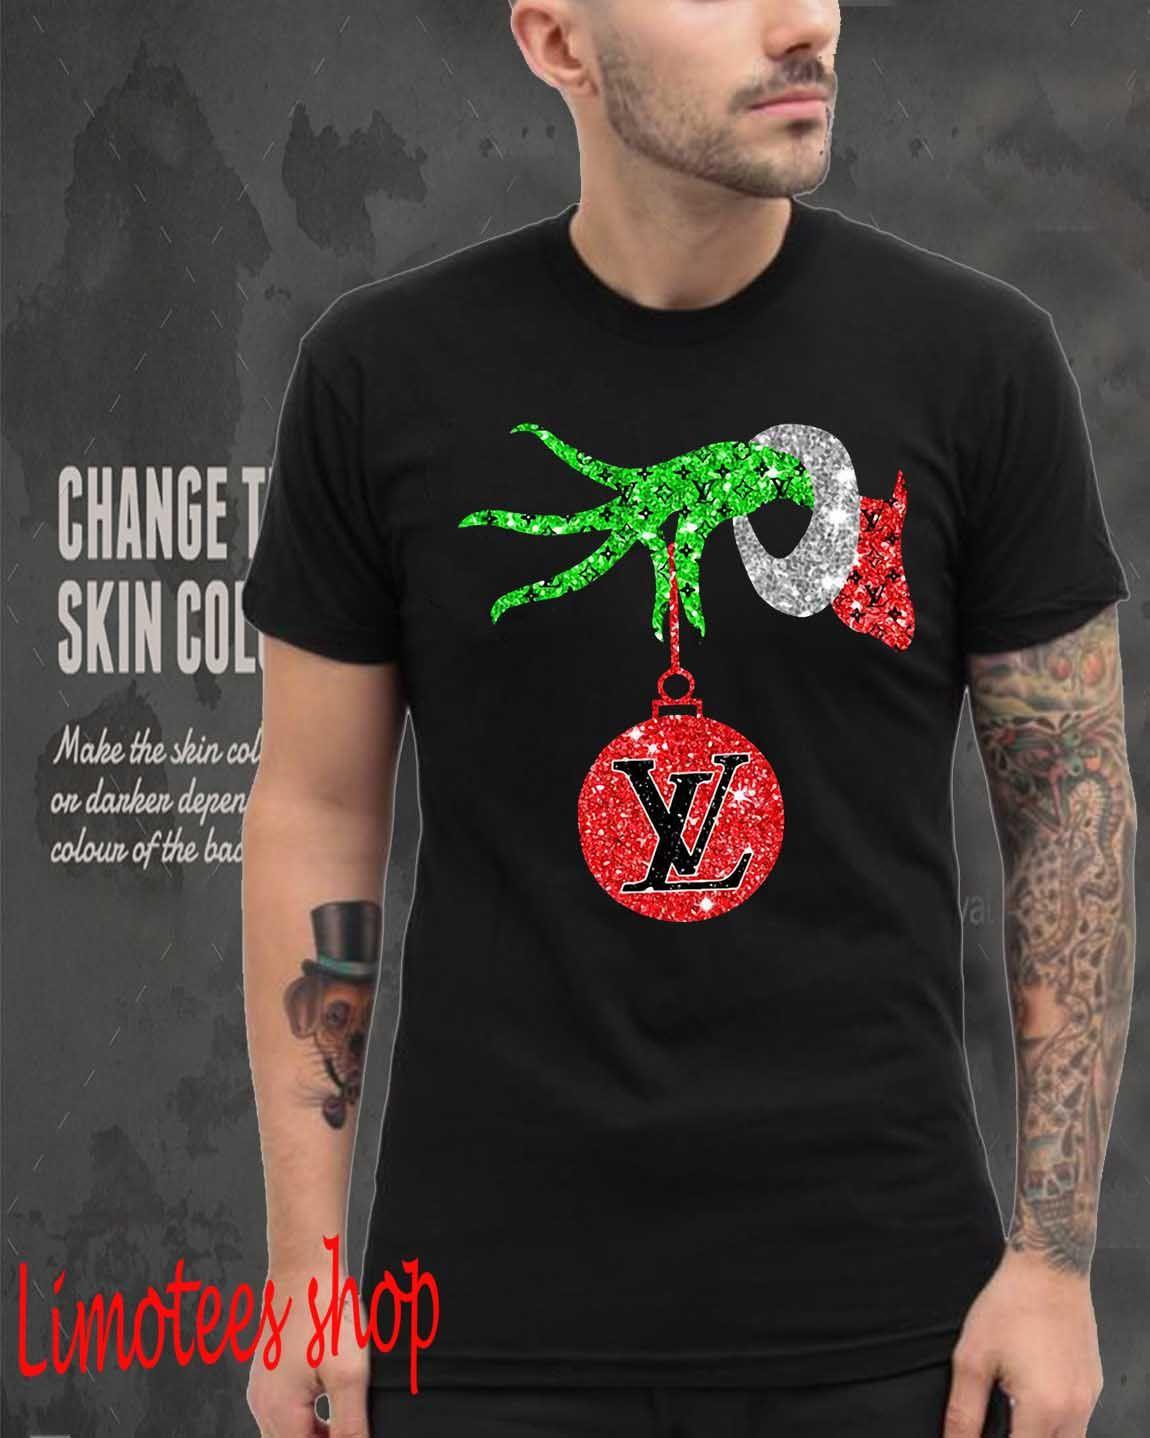 Grinch Hand Holding Louis Vuitton Ornament Shirt Youth Tee V Neck T Shirt Shirts Grinch Hands T Shirt